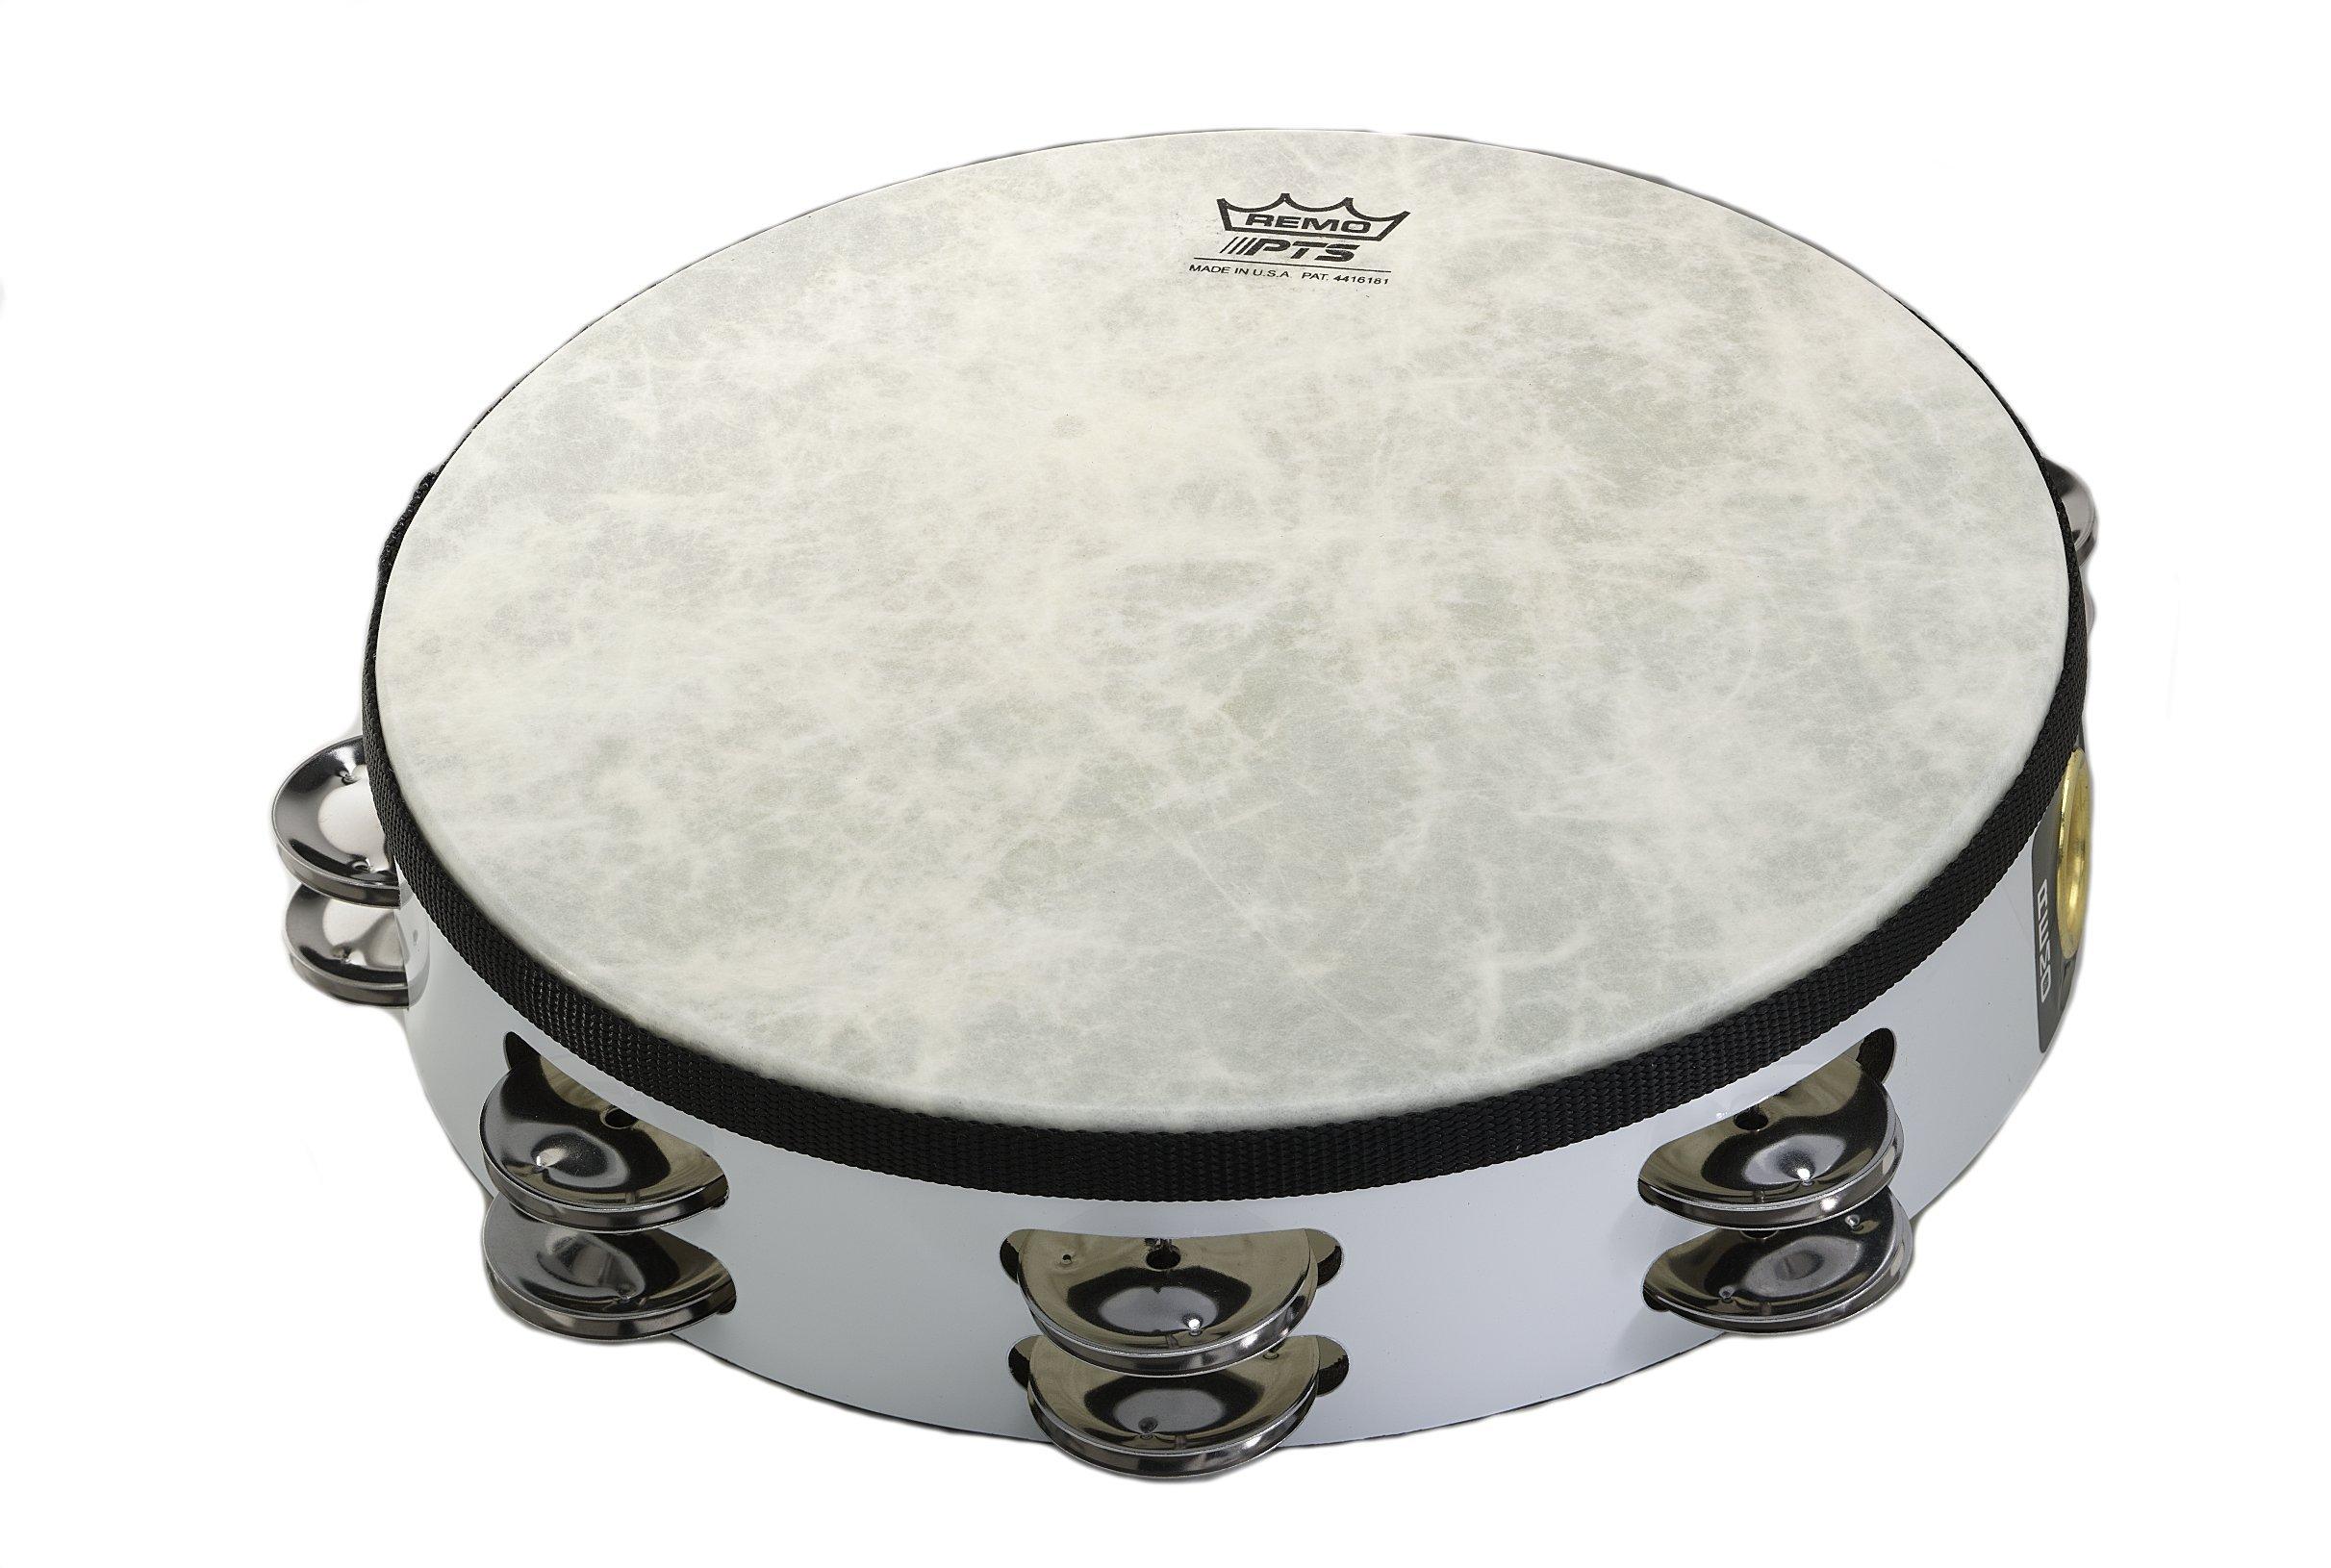 Remo TA-5210-00 Fiberskyn Tambourine - Quadura White, 10''